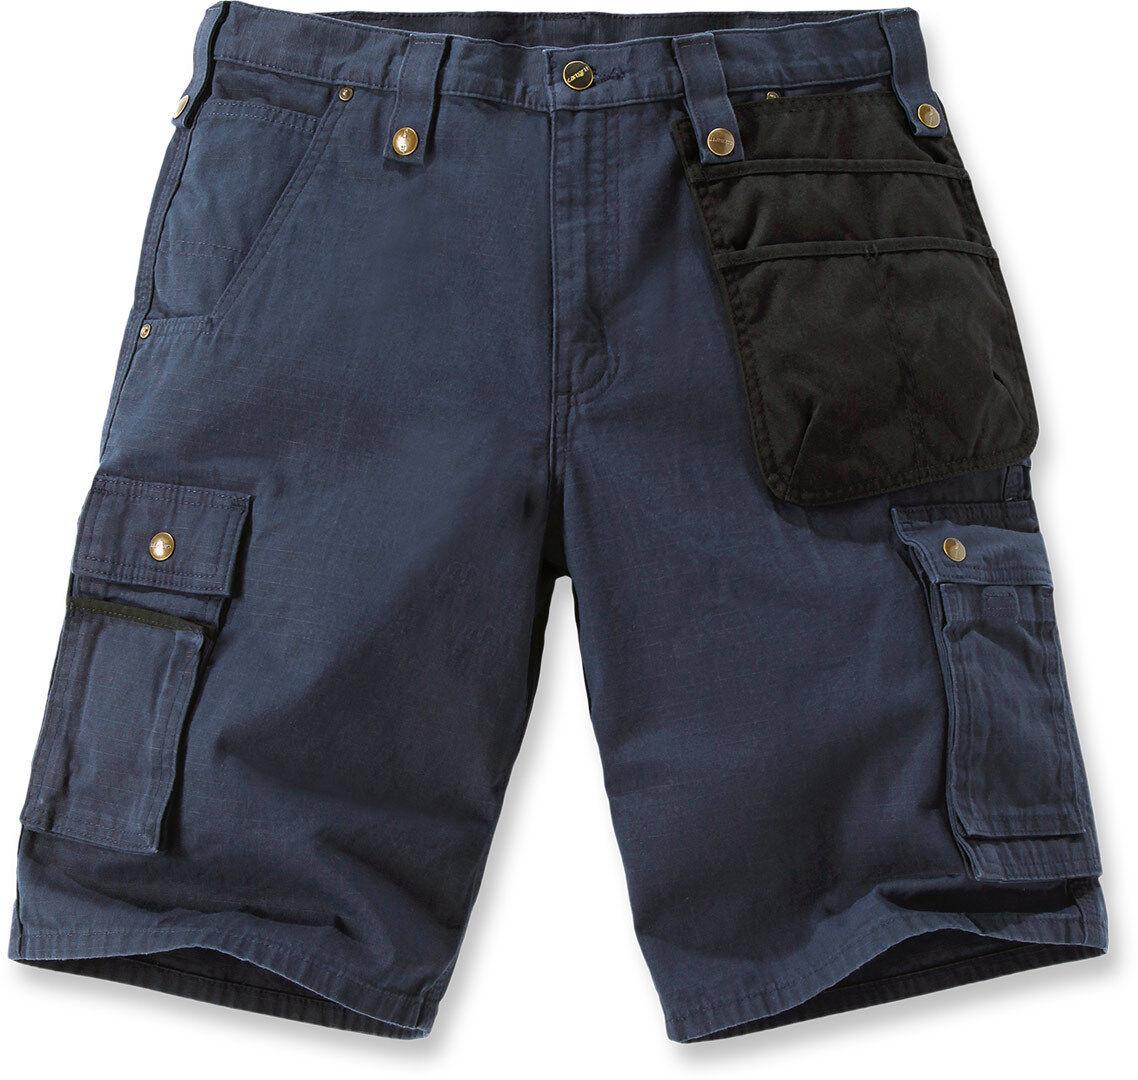 Carhartt Multi Pocket Ripstop Pantalones cortos Azul 42